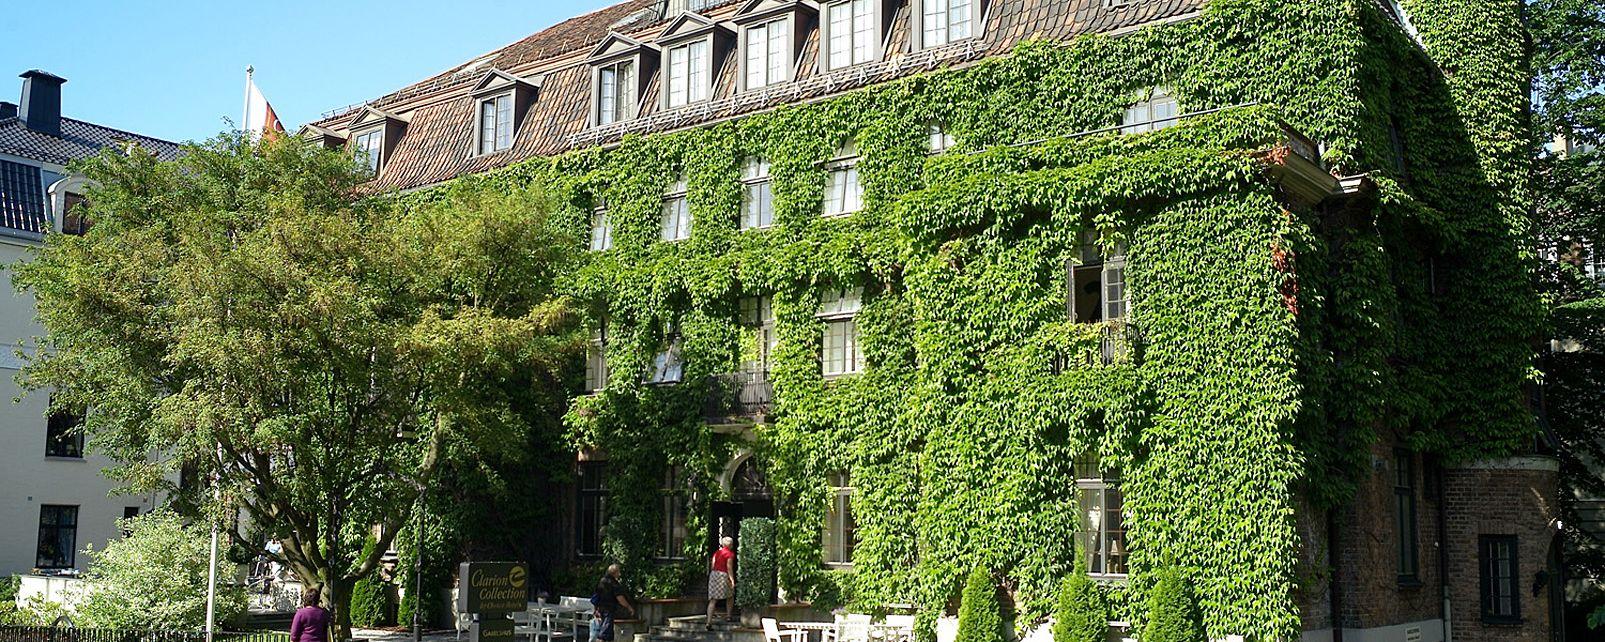 Hôtel Clarion Collection Gabelshus